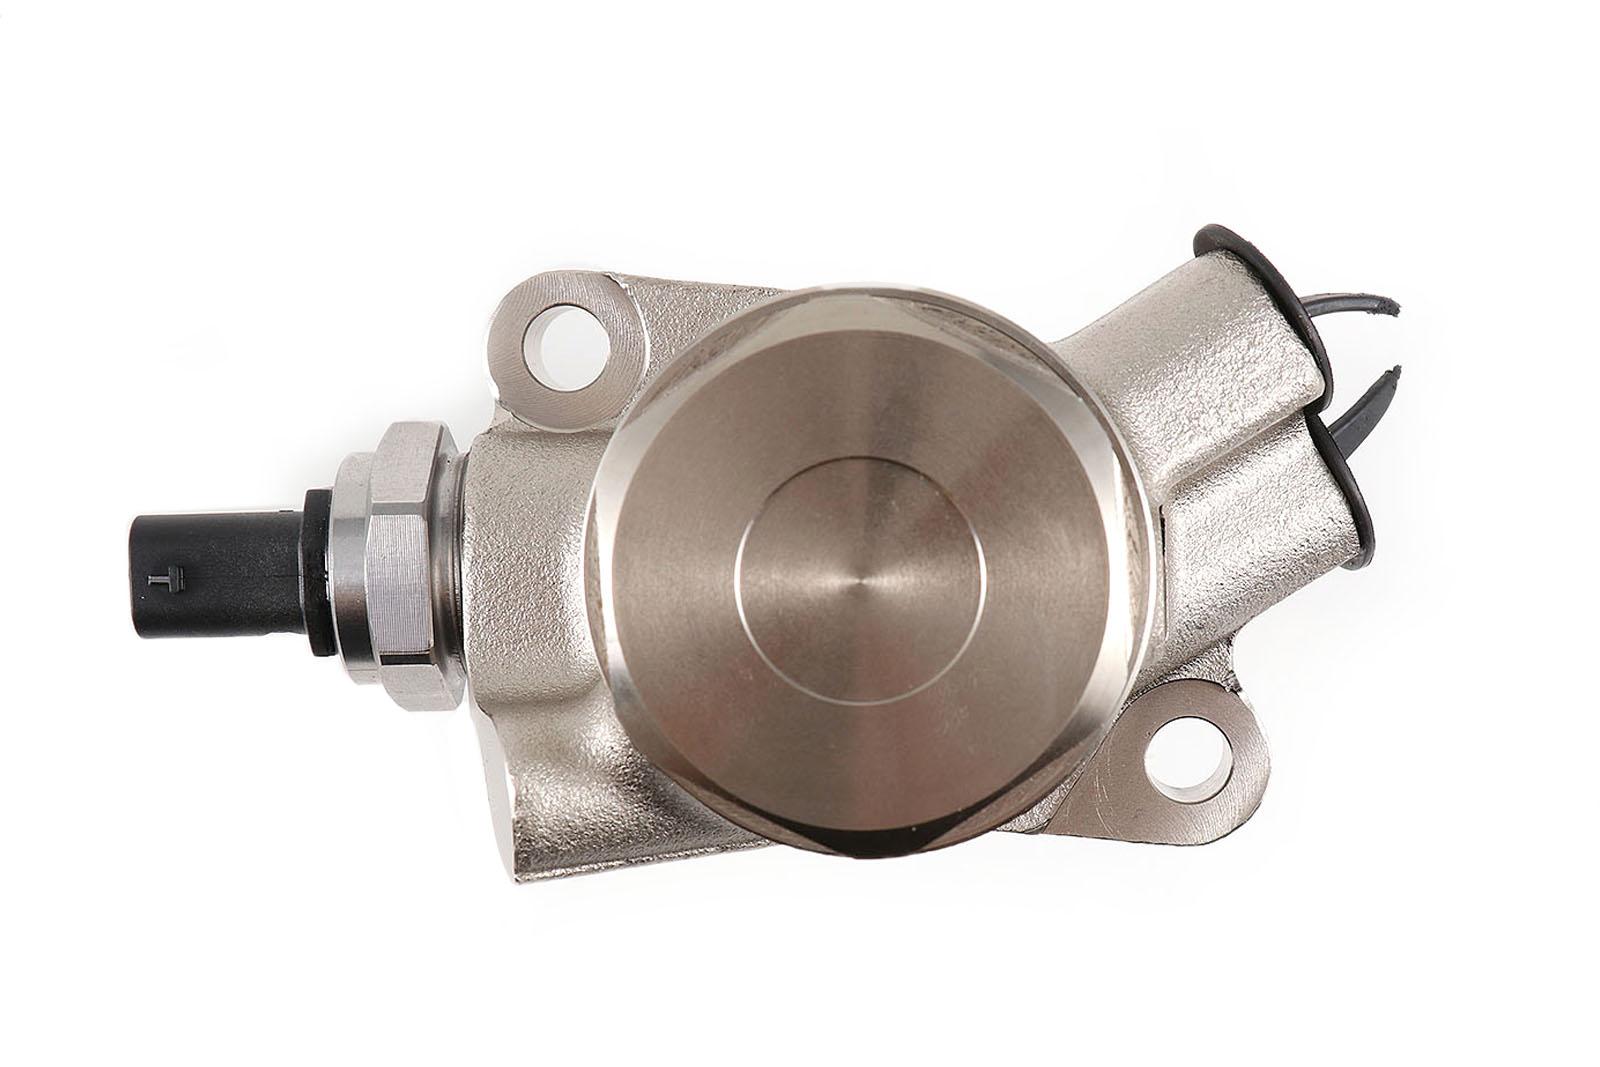 07L127025E NEU Audi RS3 8V/TT RS 8J/RSQ3/R8 V10 2.5l/5.2l TFSI Hochdruckpumpe